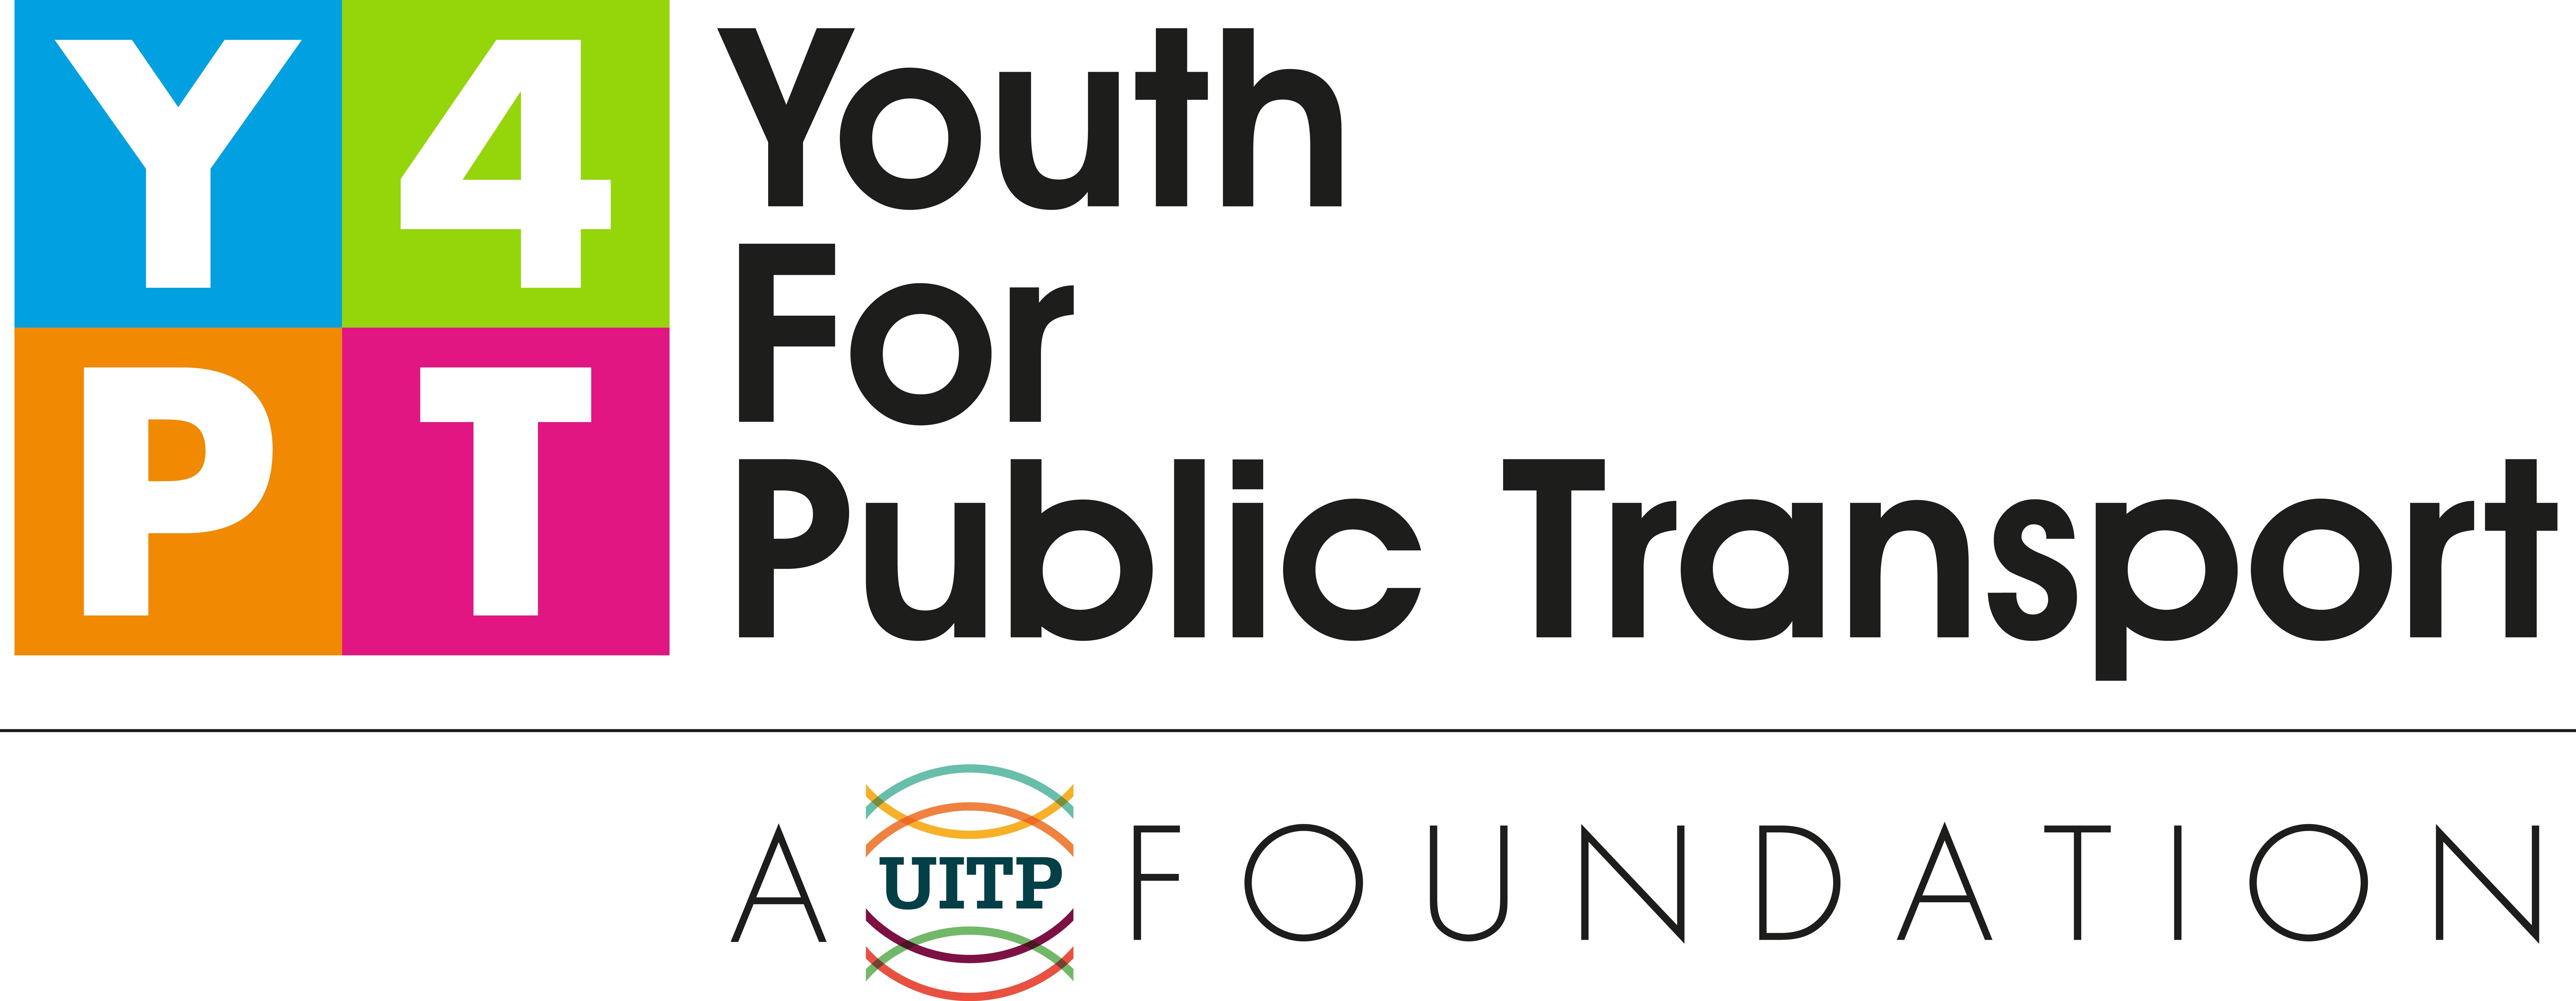 http://www.travelspirit.io/wp-content/uploads/2016/09/Y4PT-UITP-Foundation-Logo-jpg.jpg